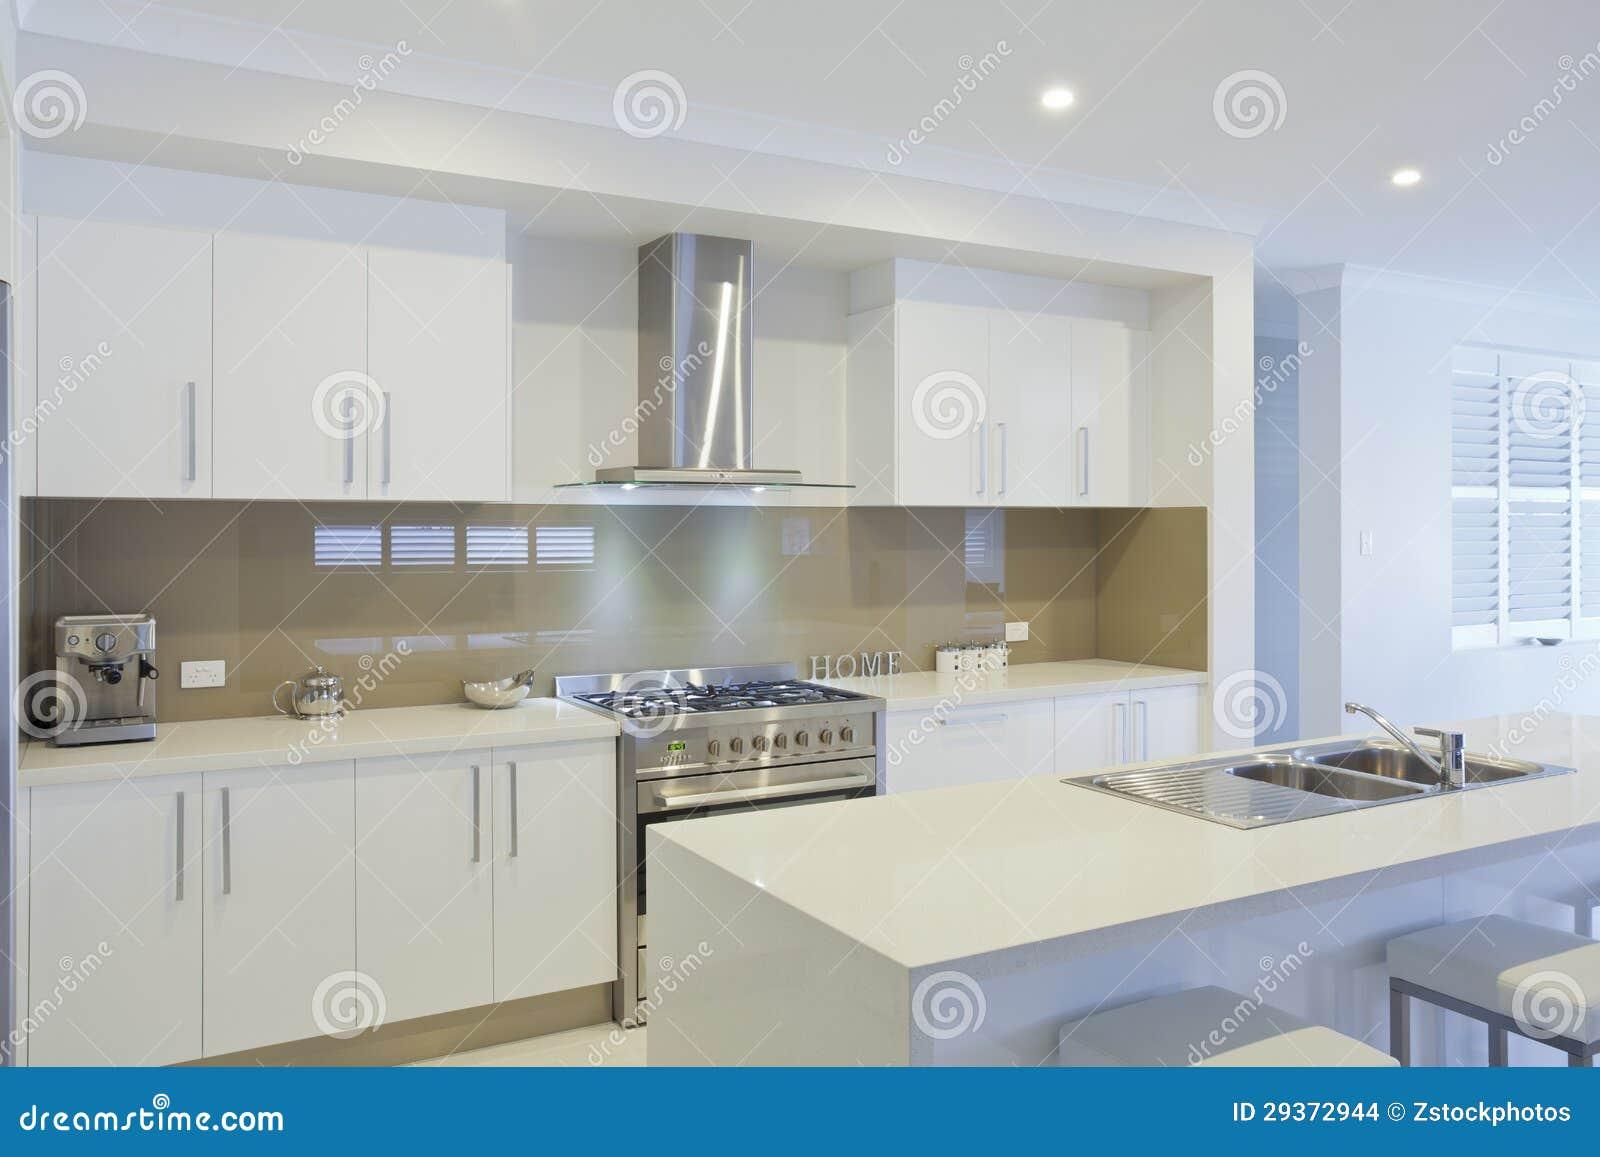 Cucina Moderna Nuova.Nuova Cucina Moderna Fotografia Stock Immagine Di